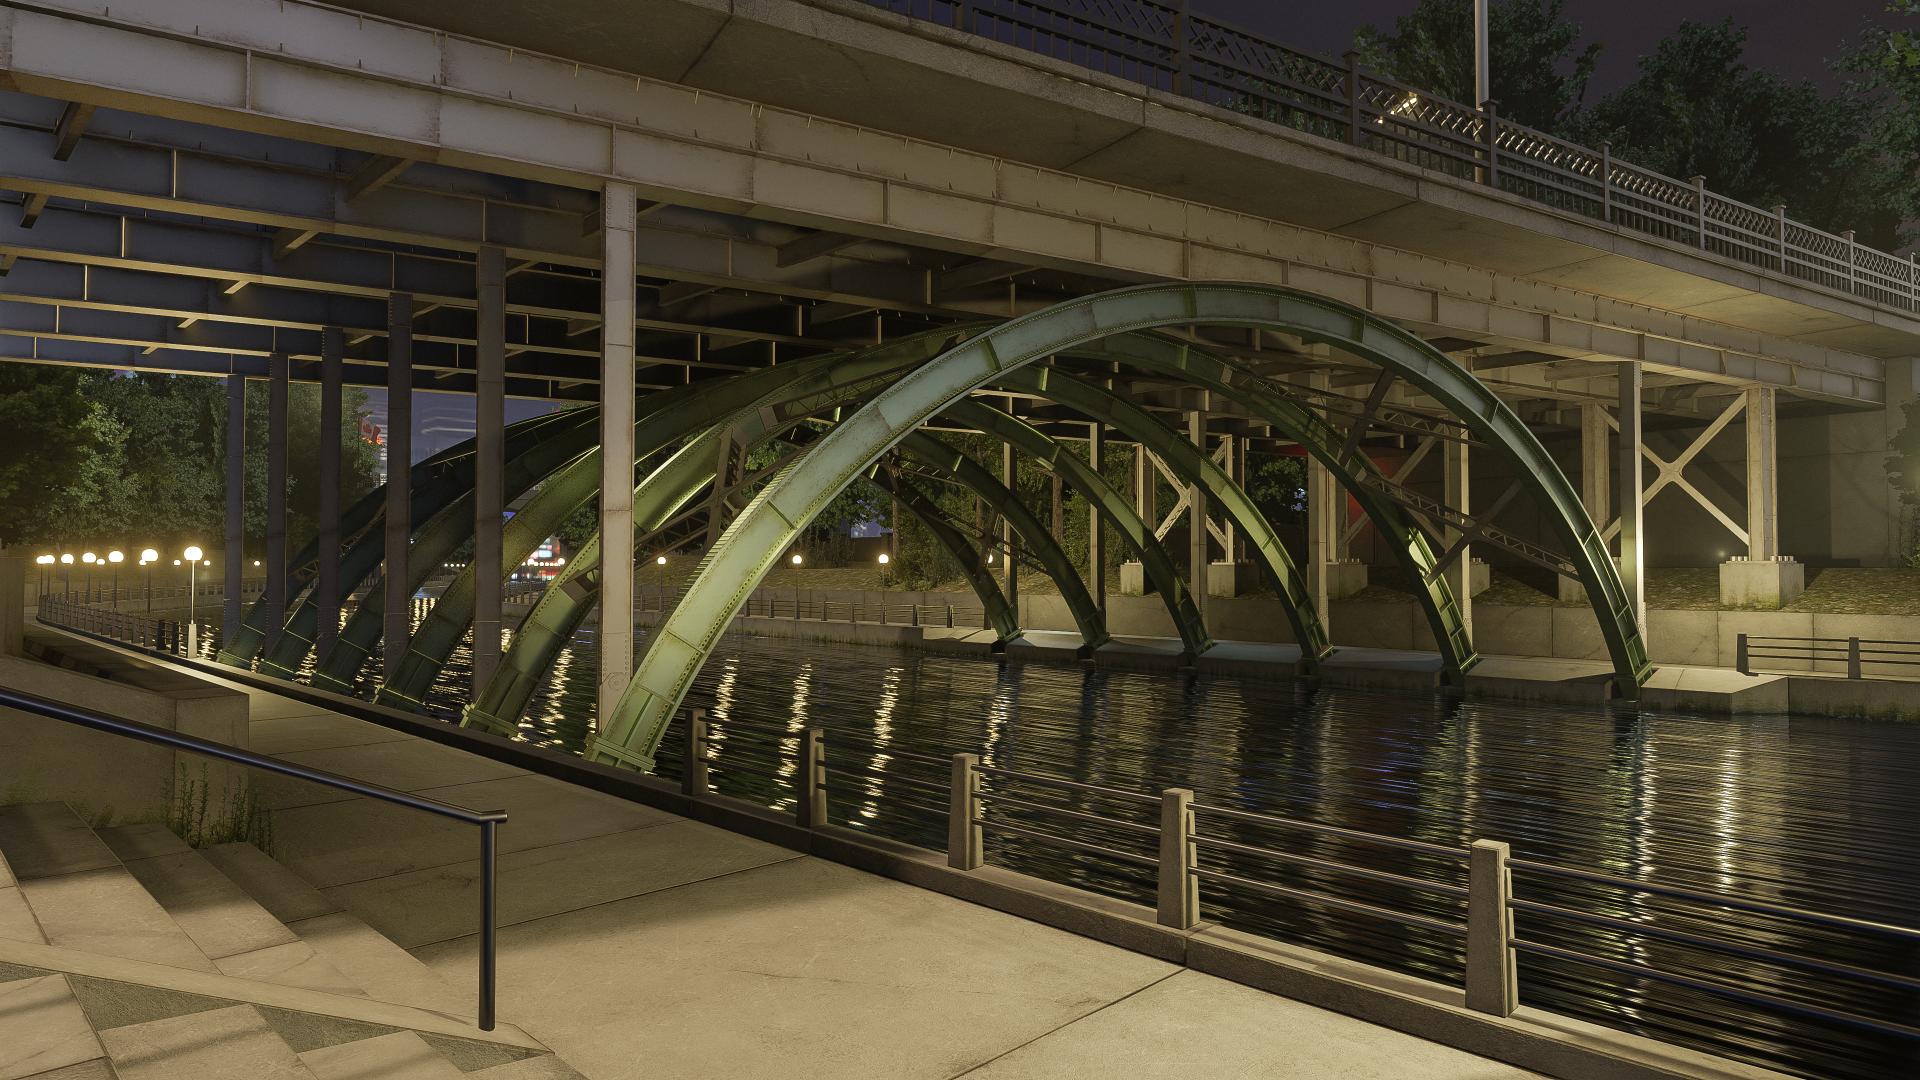 bridge_01.png.b18b7c54c610bcec11b0864dfd7ce11a.png